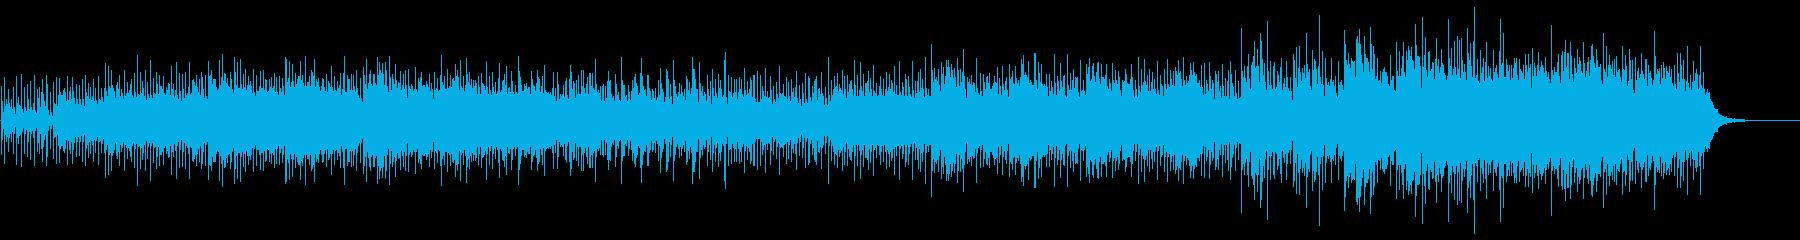 PortisheadとMassiv...の再生済みの波形